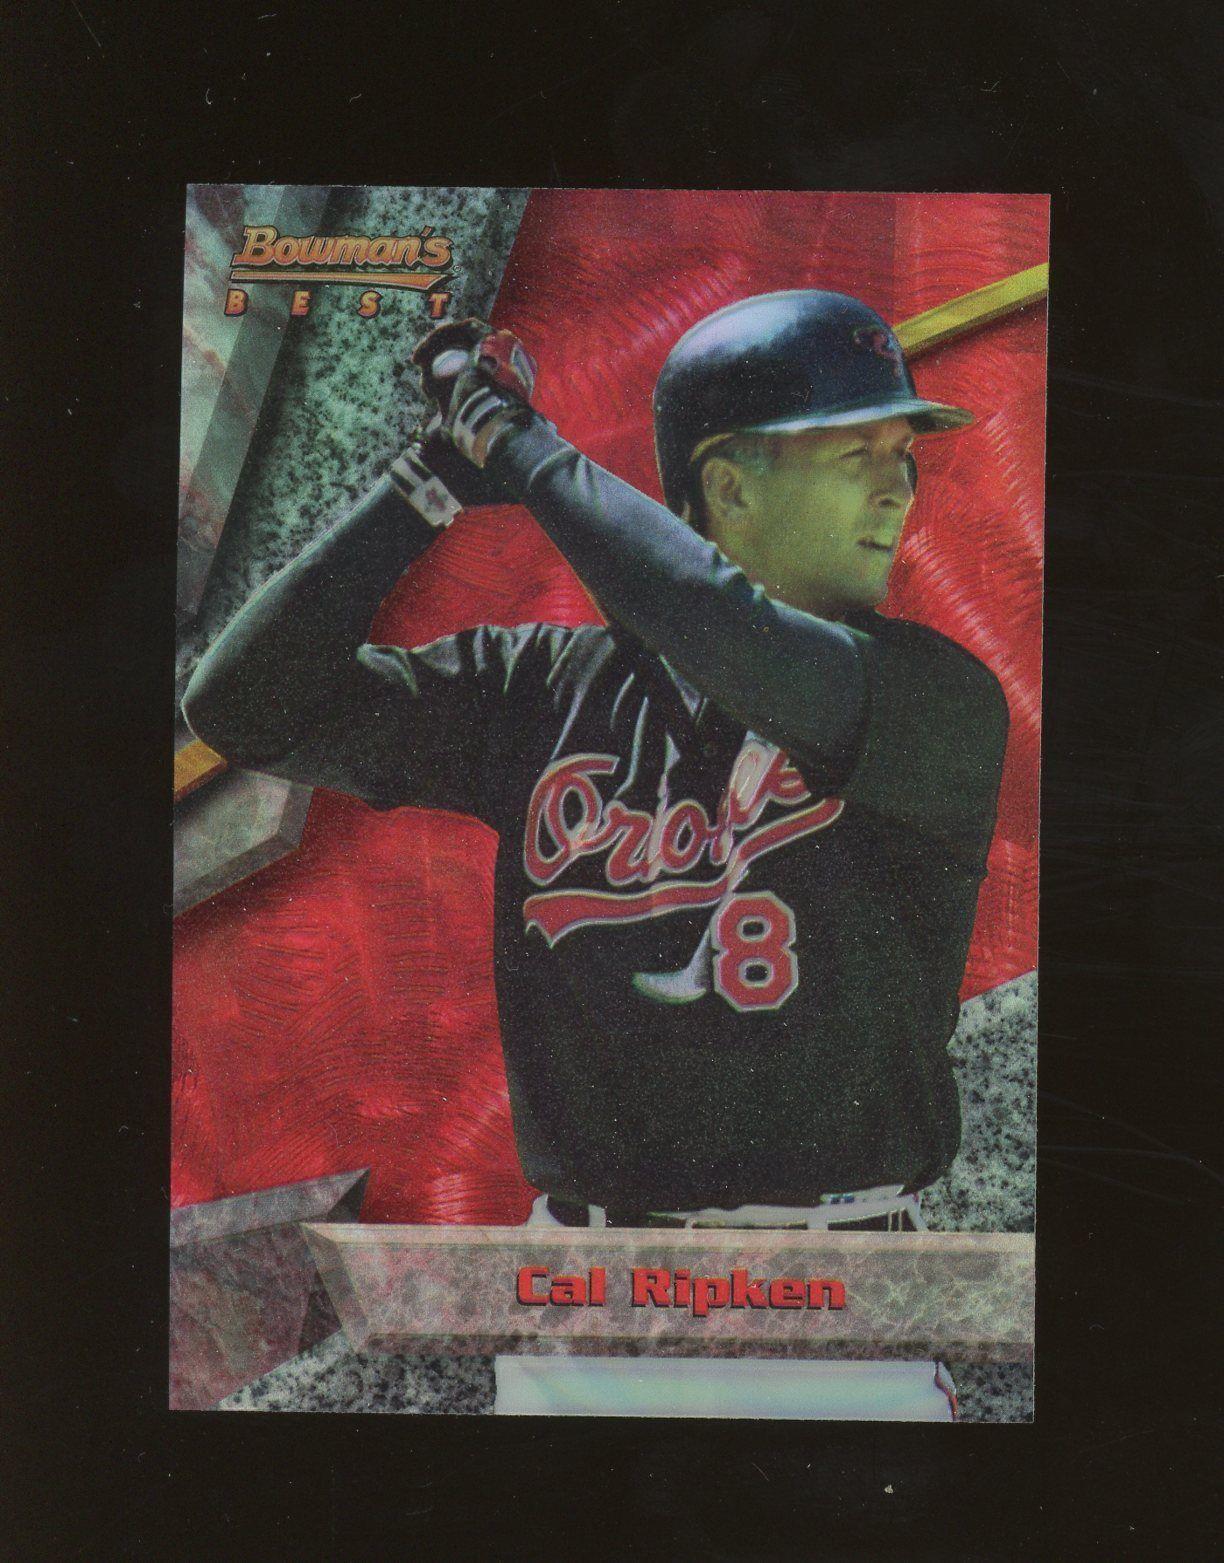 1994 Bowmans Best Red Refractor Cal Ripken Jr Baltimore